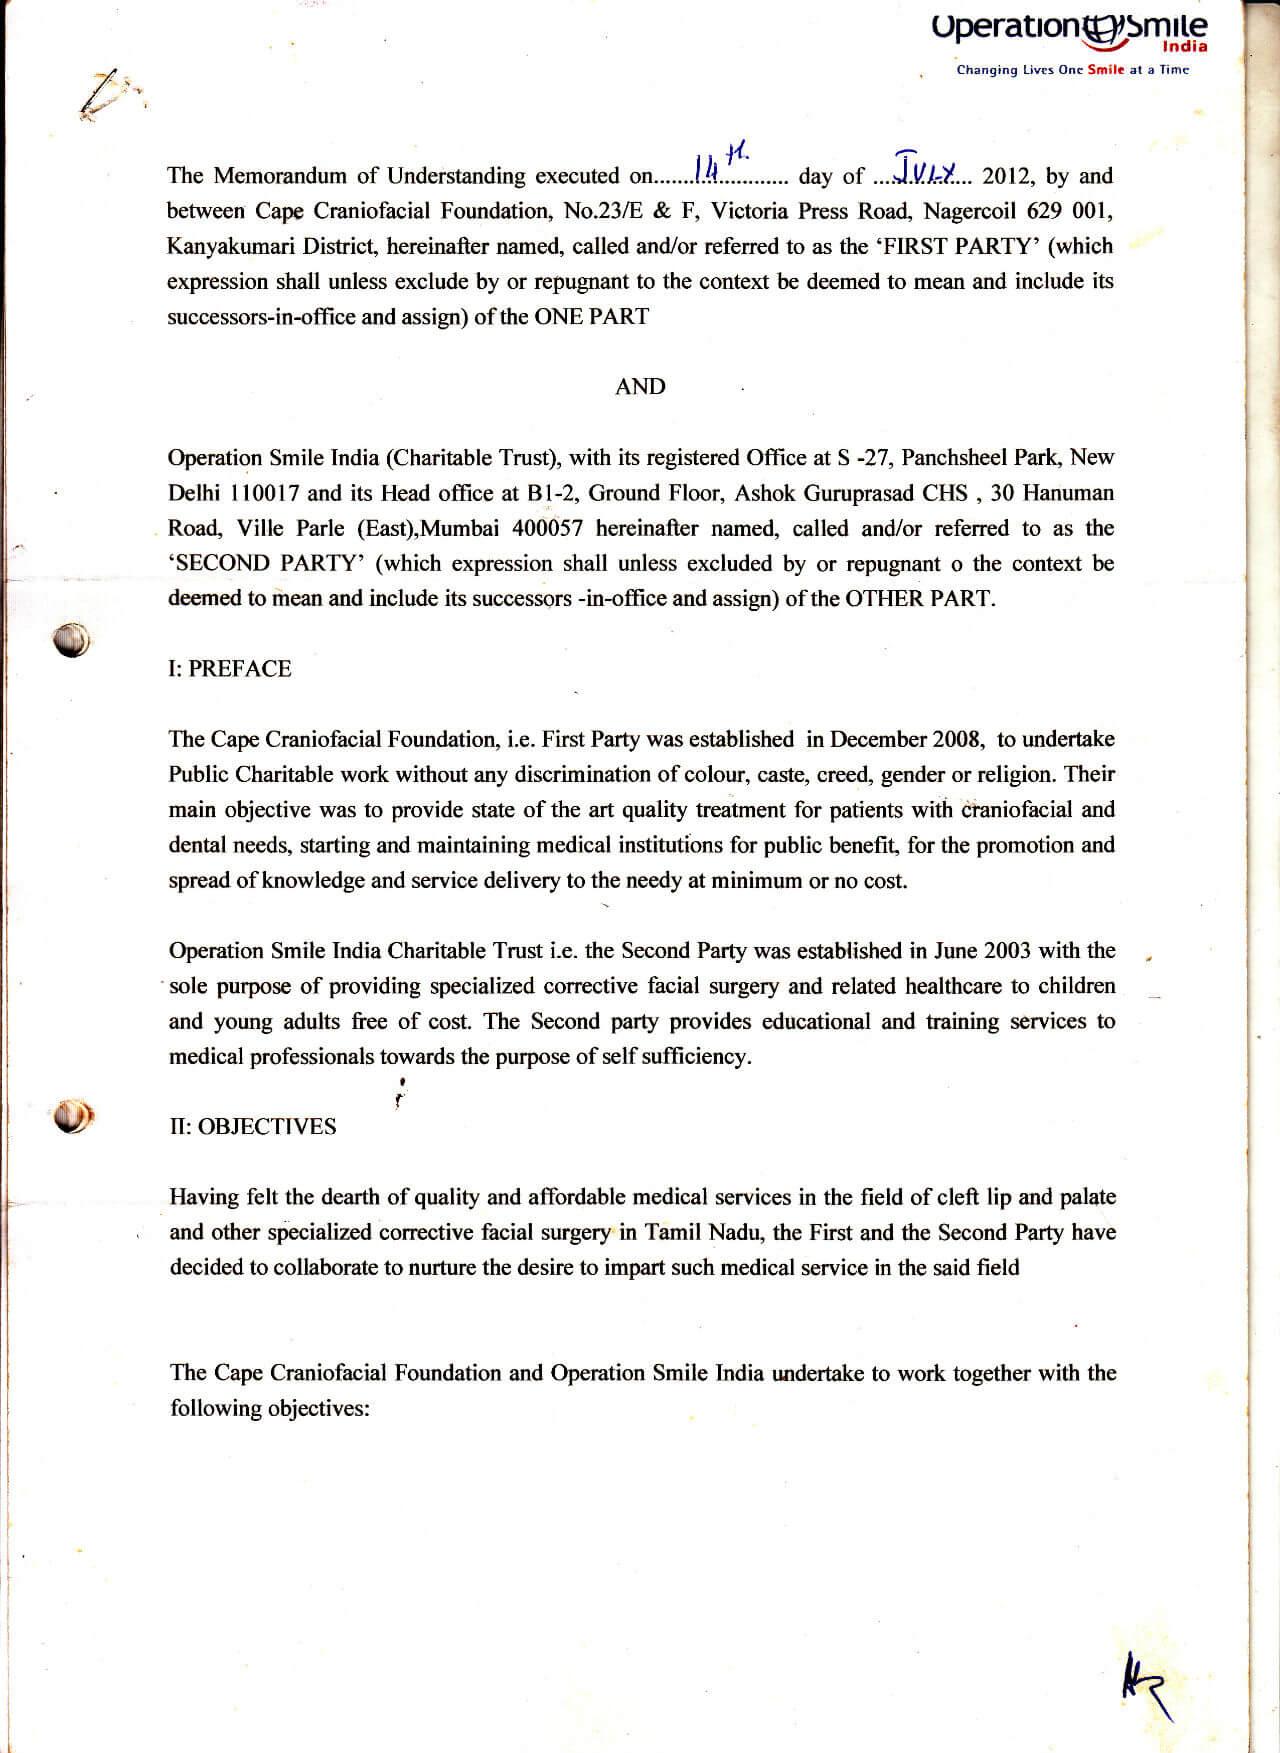 Operation Smile India Agreement 1